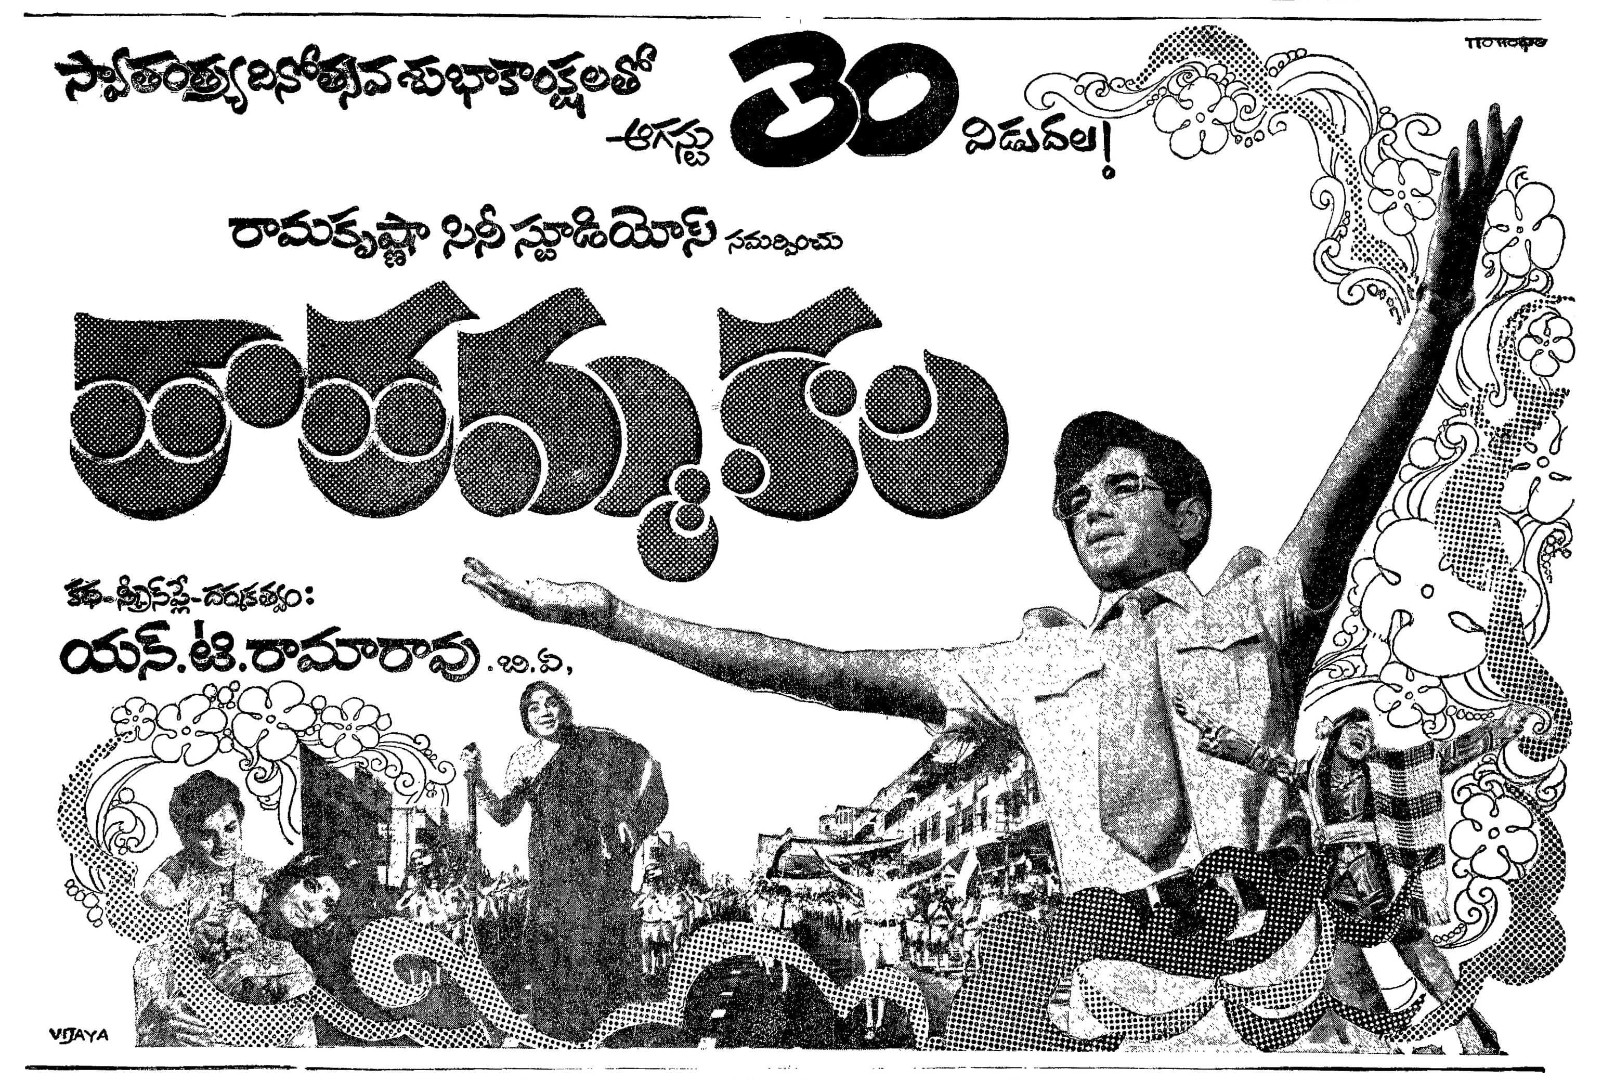 Thatamma Kala 1974 Aug 30 release (1974).jpeg